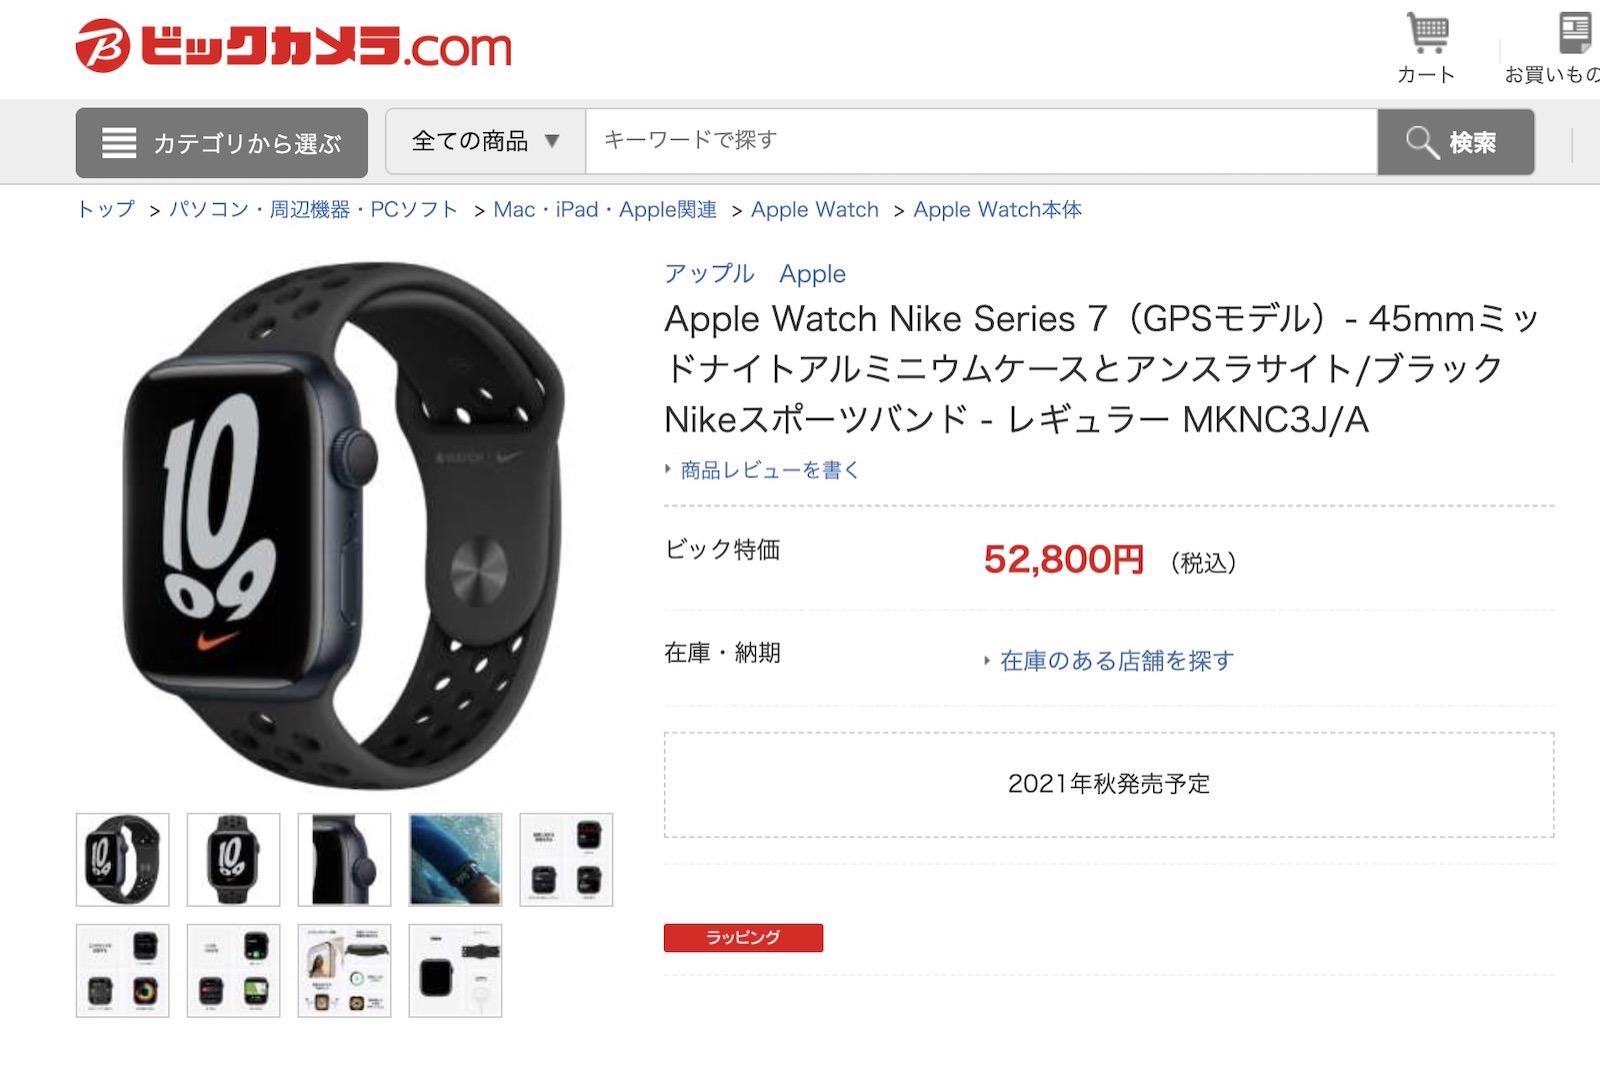 Biccamera apple watch series7 pricing